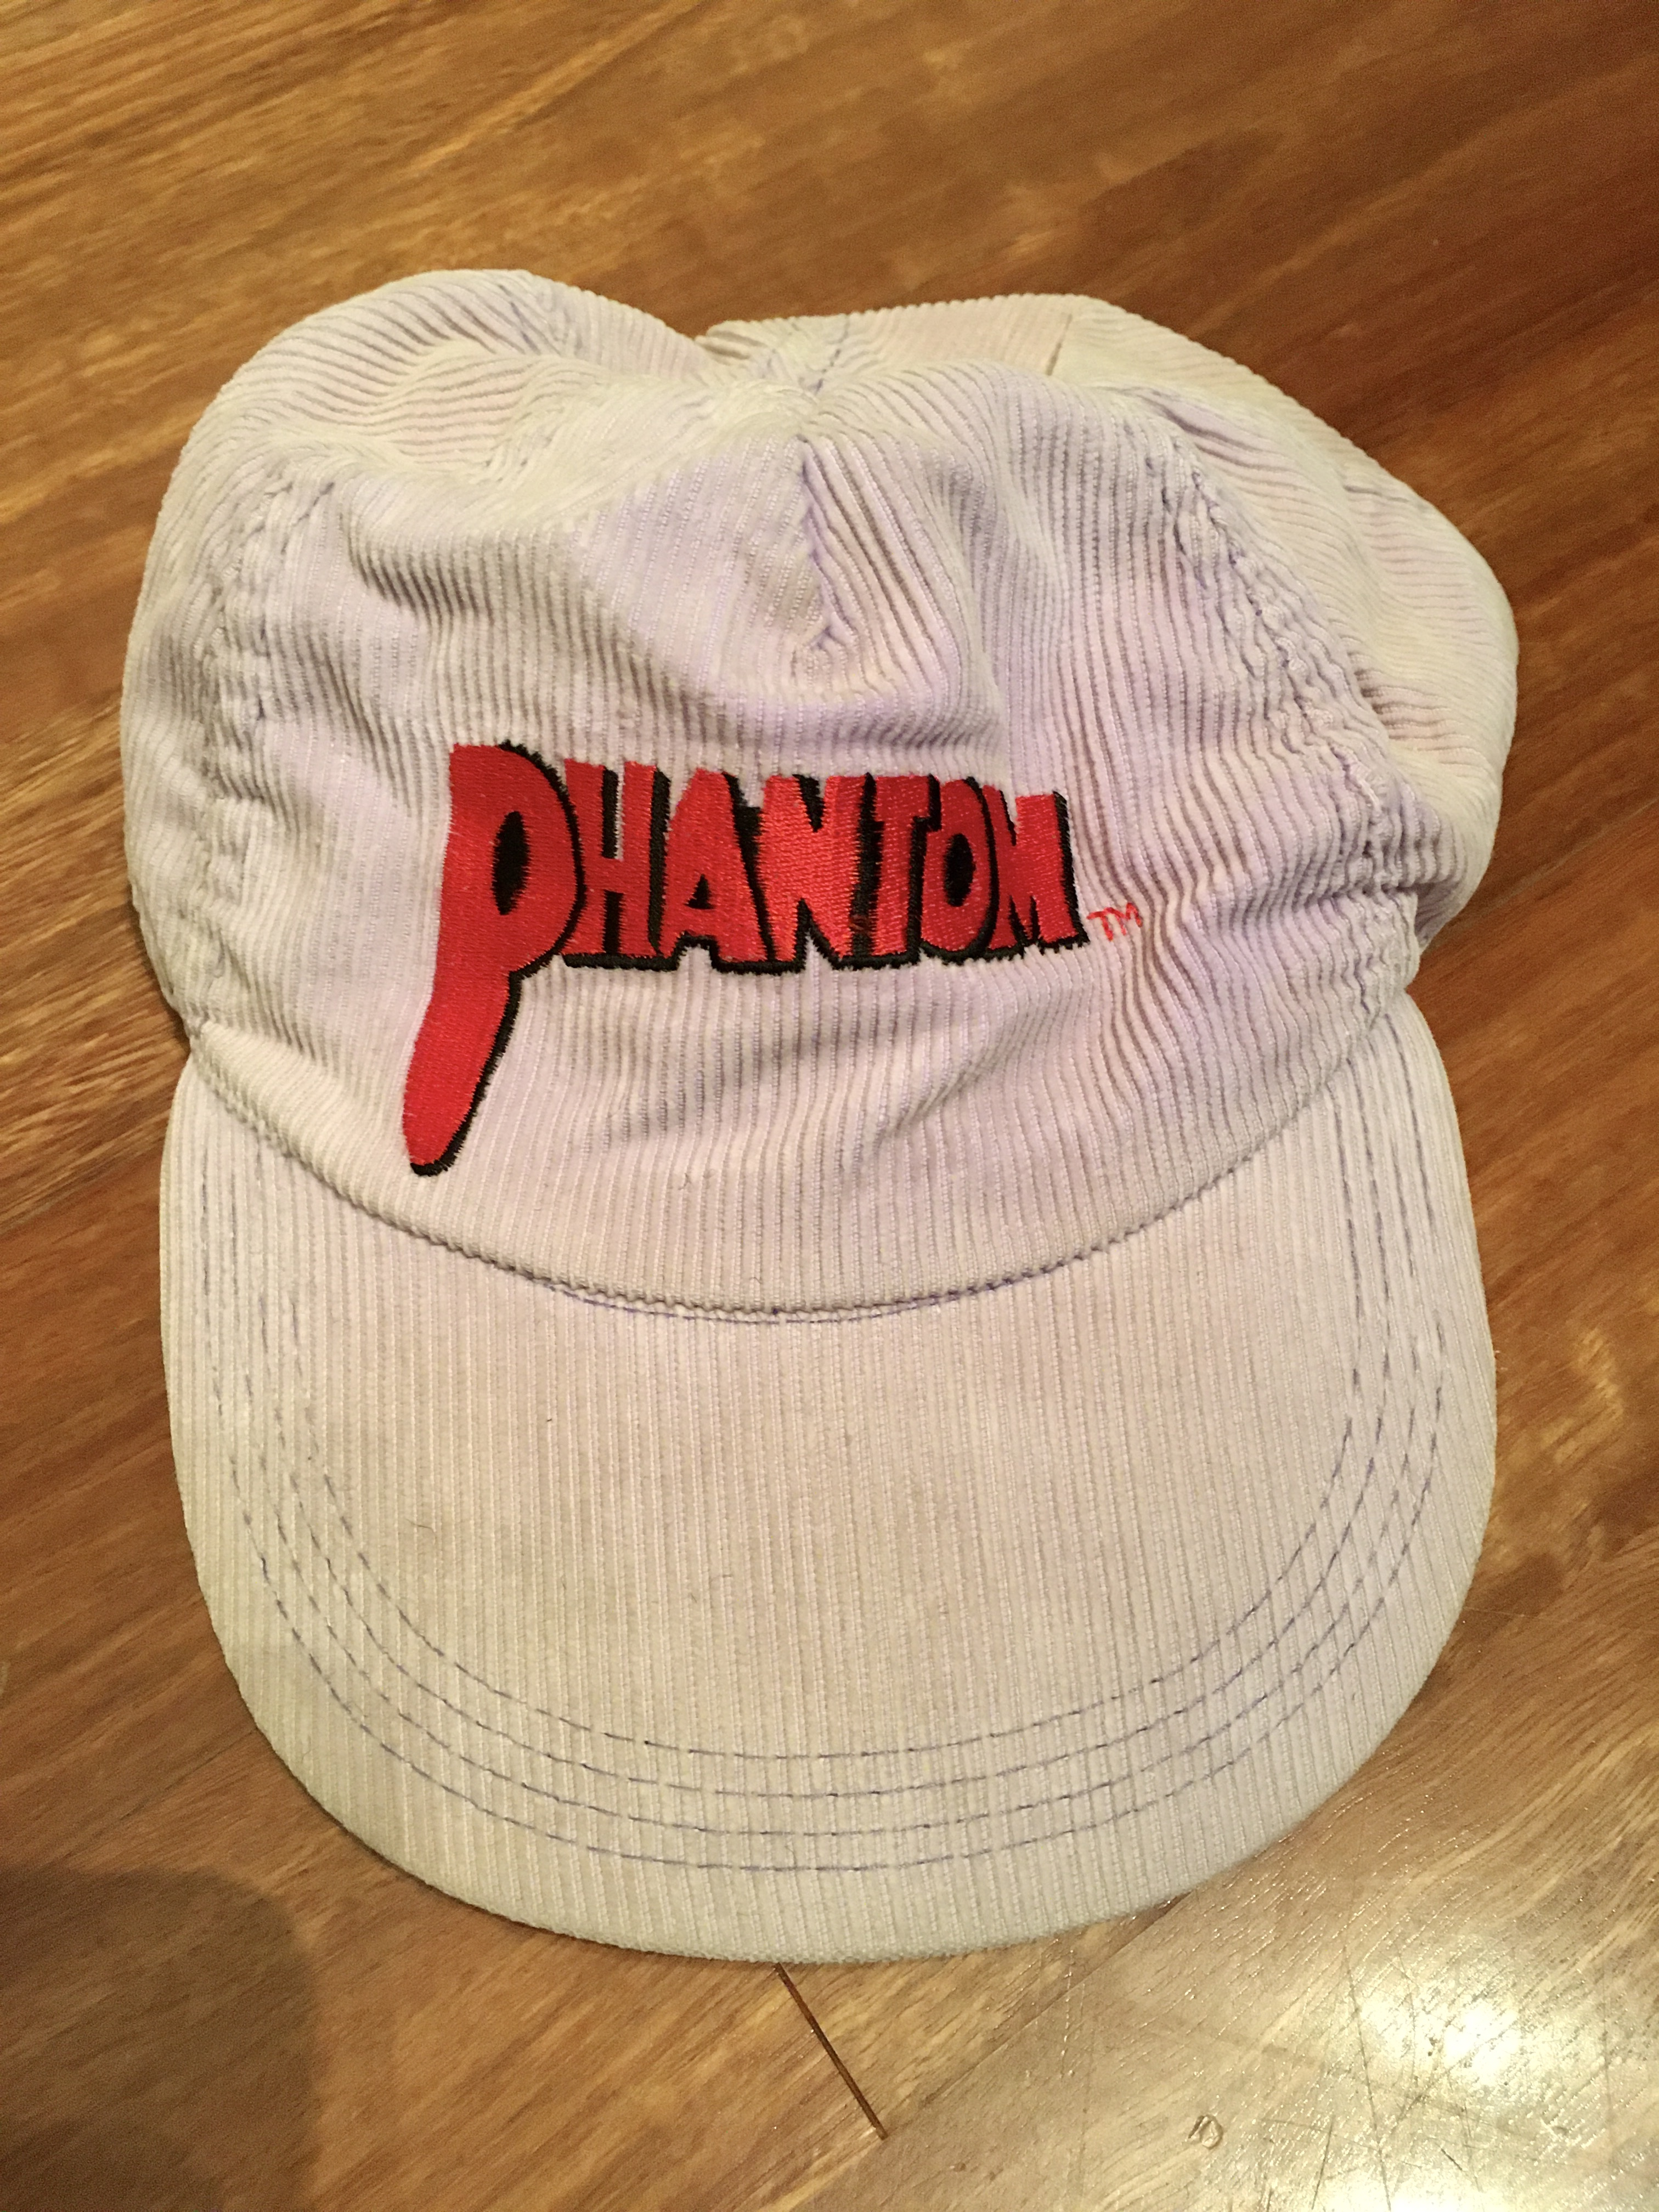 1990s Phantoms hat